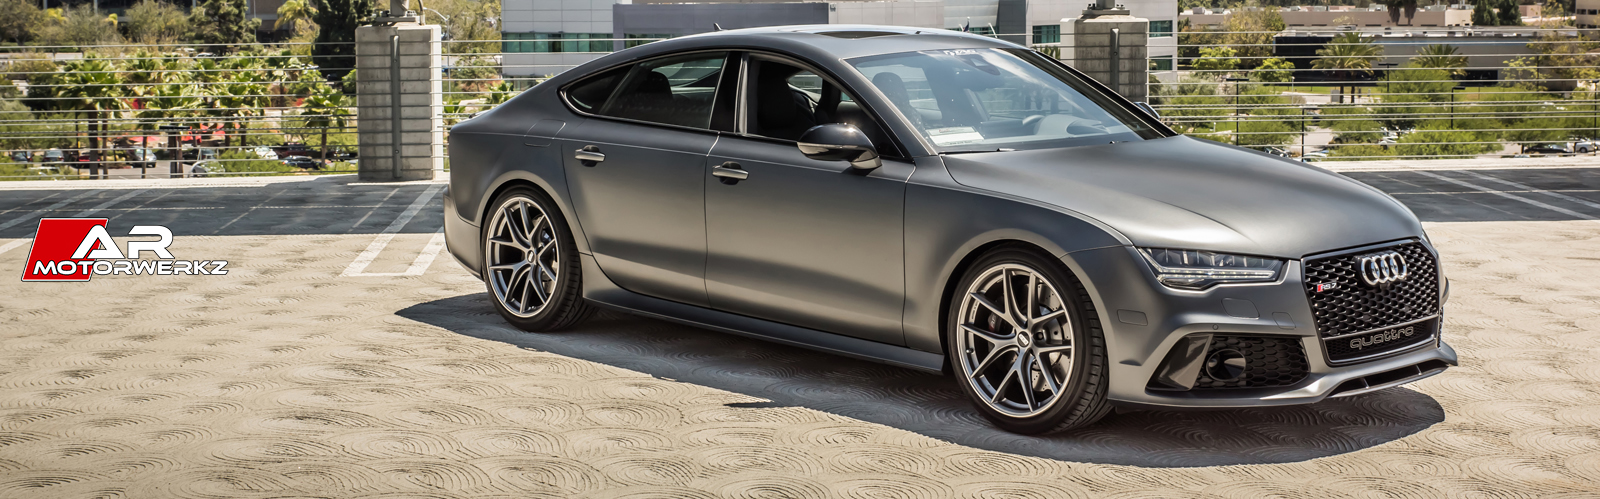 Audi S7 Matte Grey Bbs Ci R Ar Motorwerkz